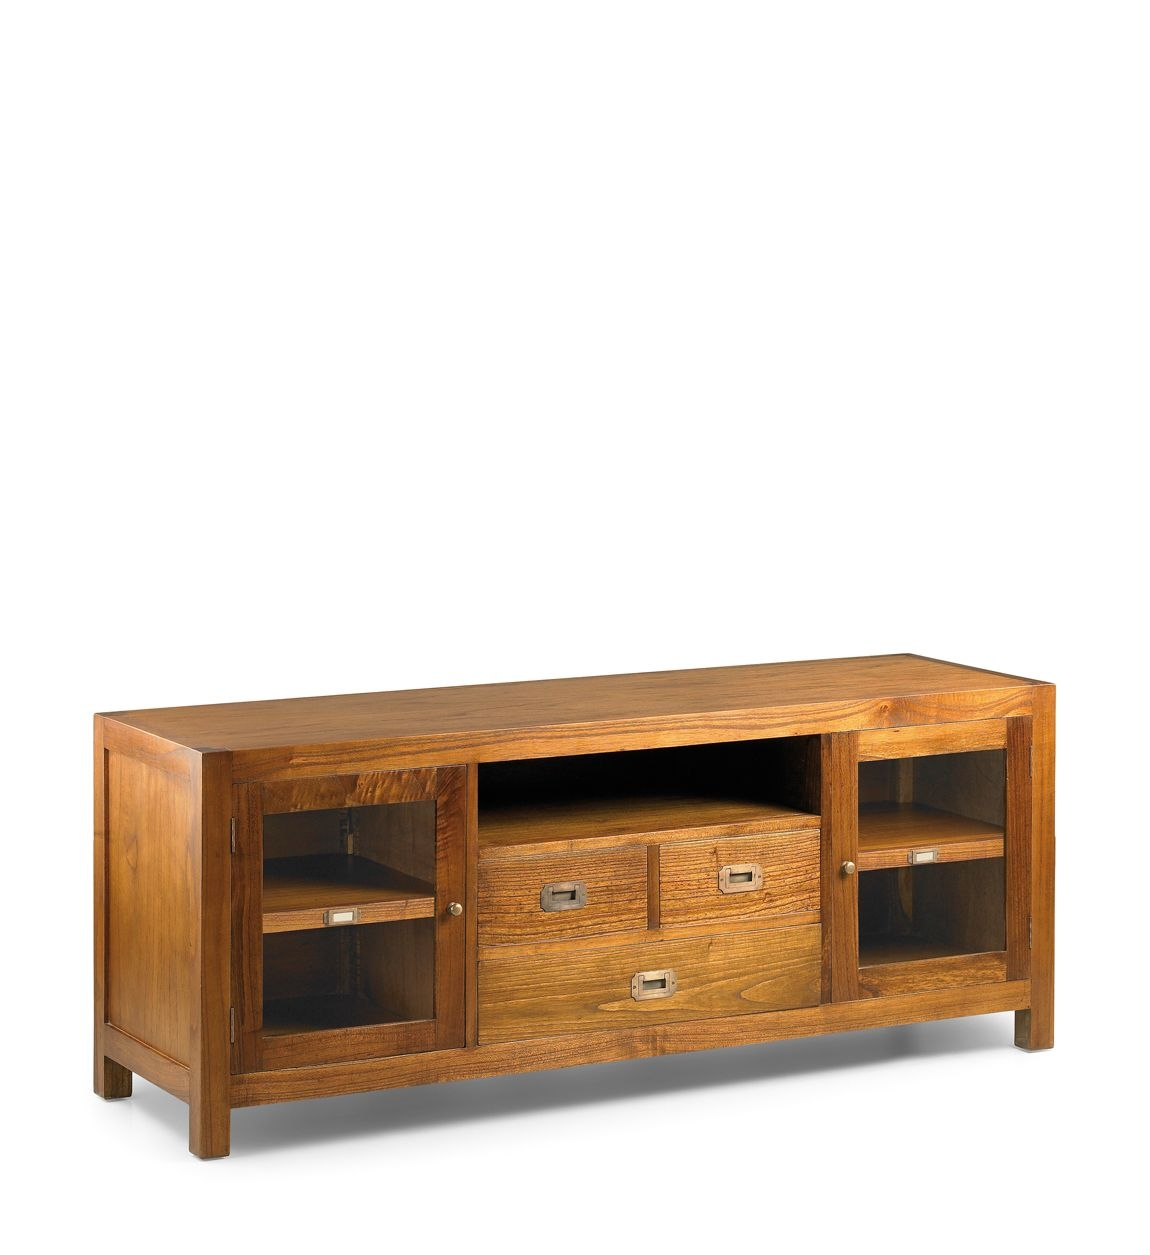 Comoda TV din lemn cu 3 sertare si 2 usi Star Nuc, l150xA45xH60 cm imagine